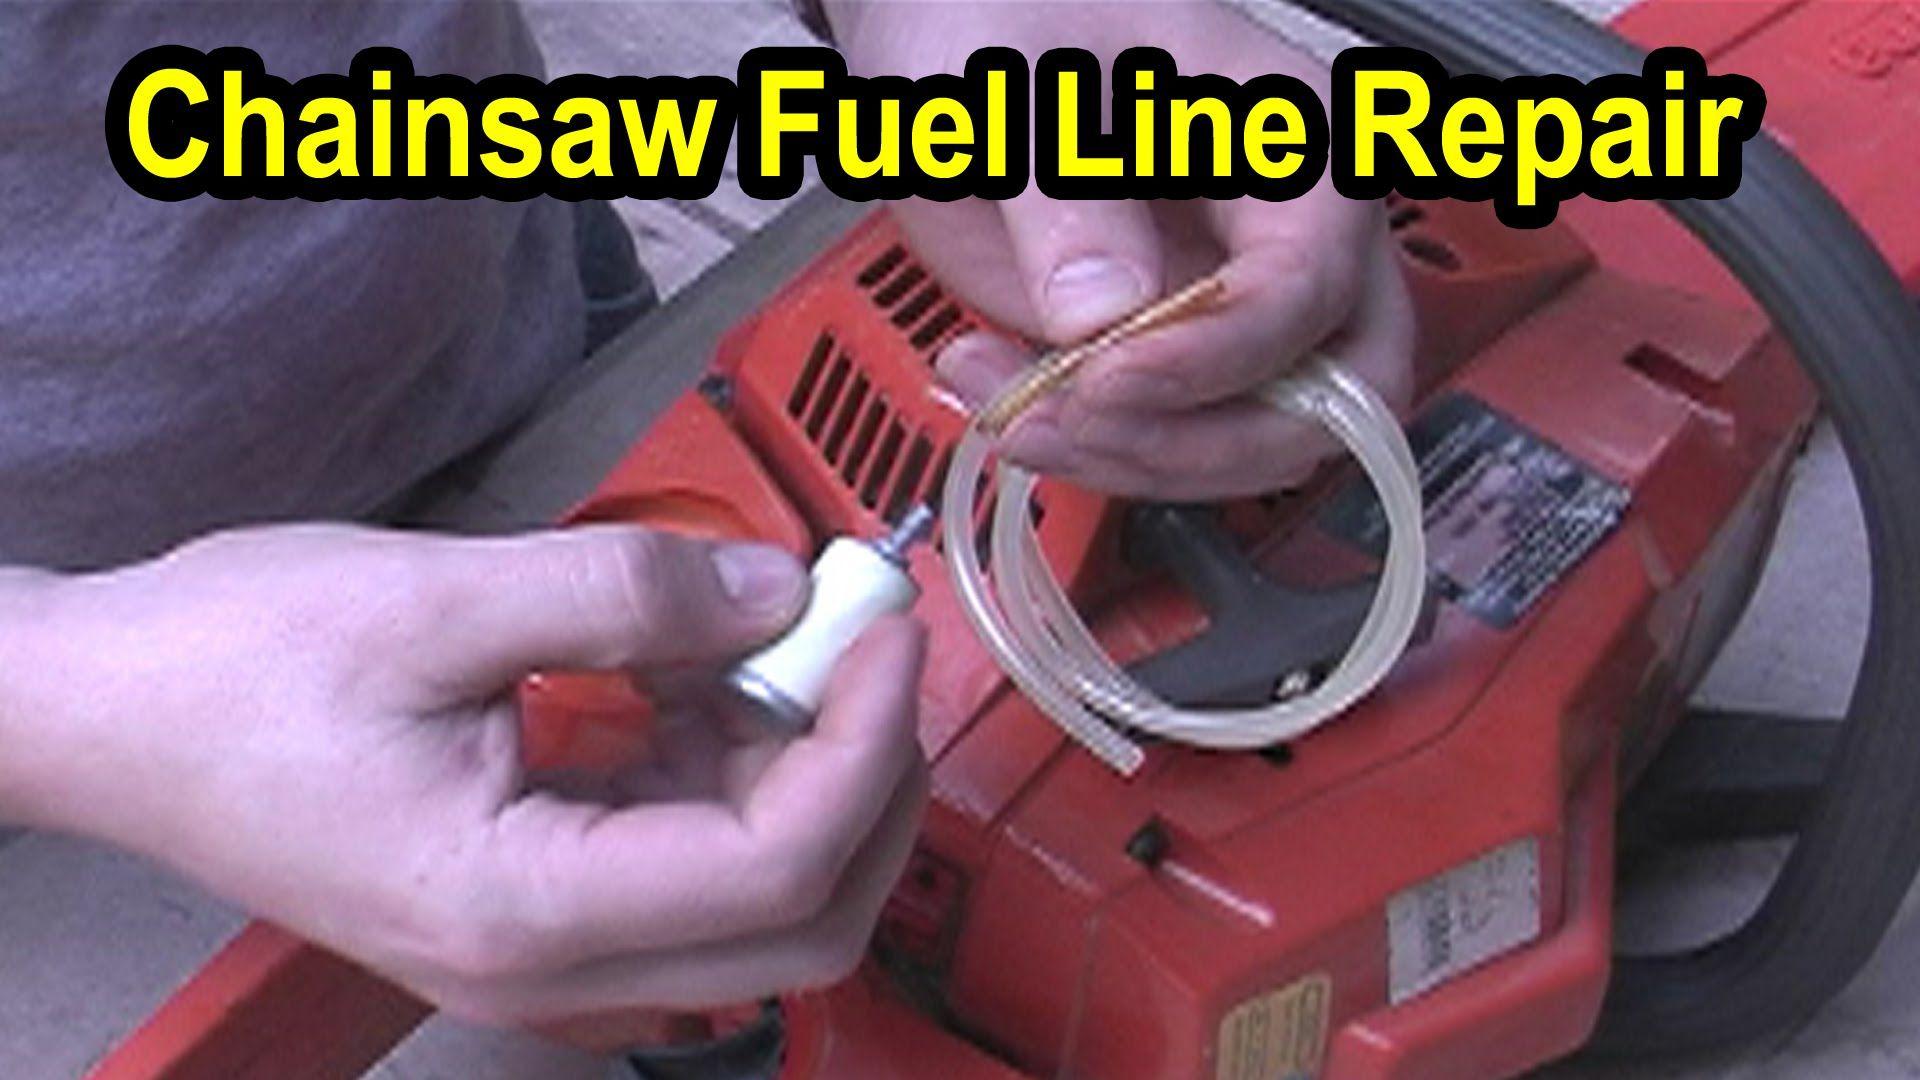 Chainsaw Fuel Line Repair Husqvarna Model 141 Lawn Mower